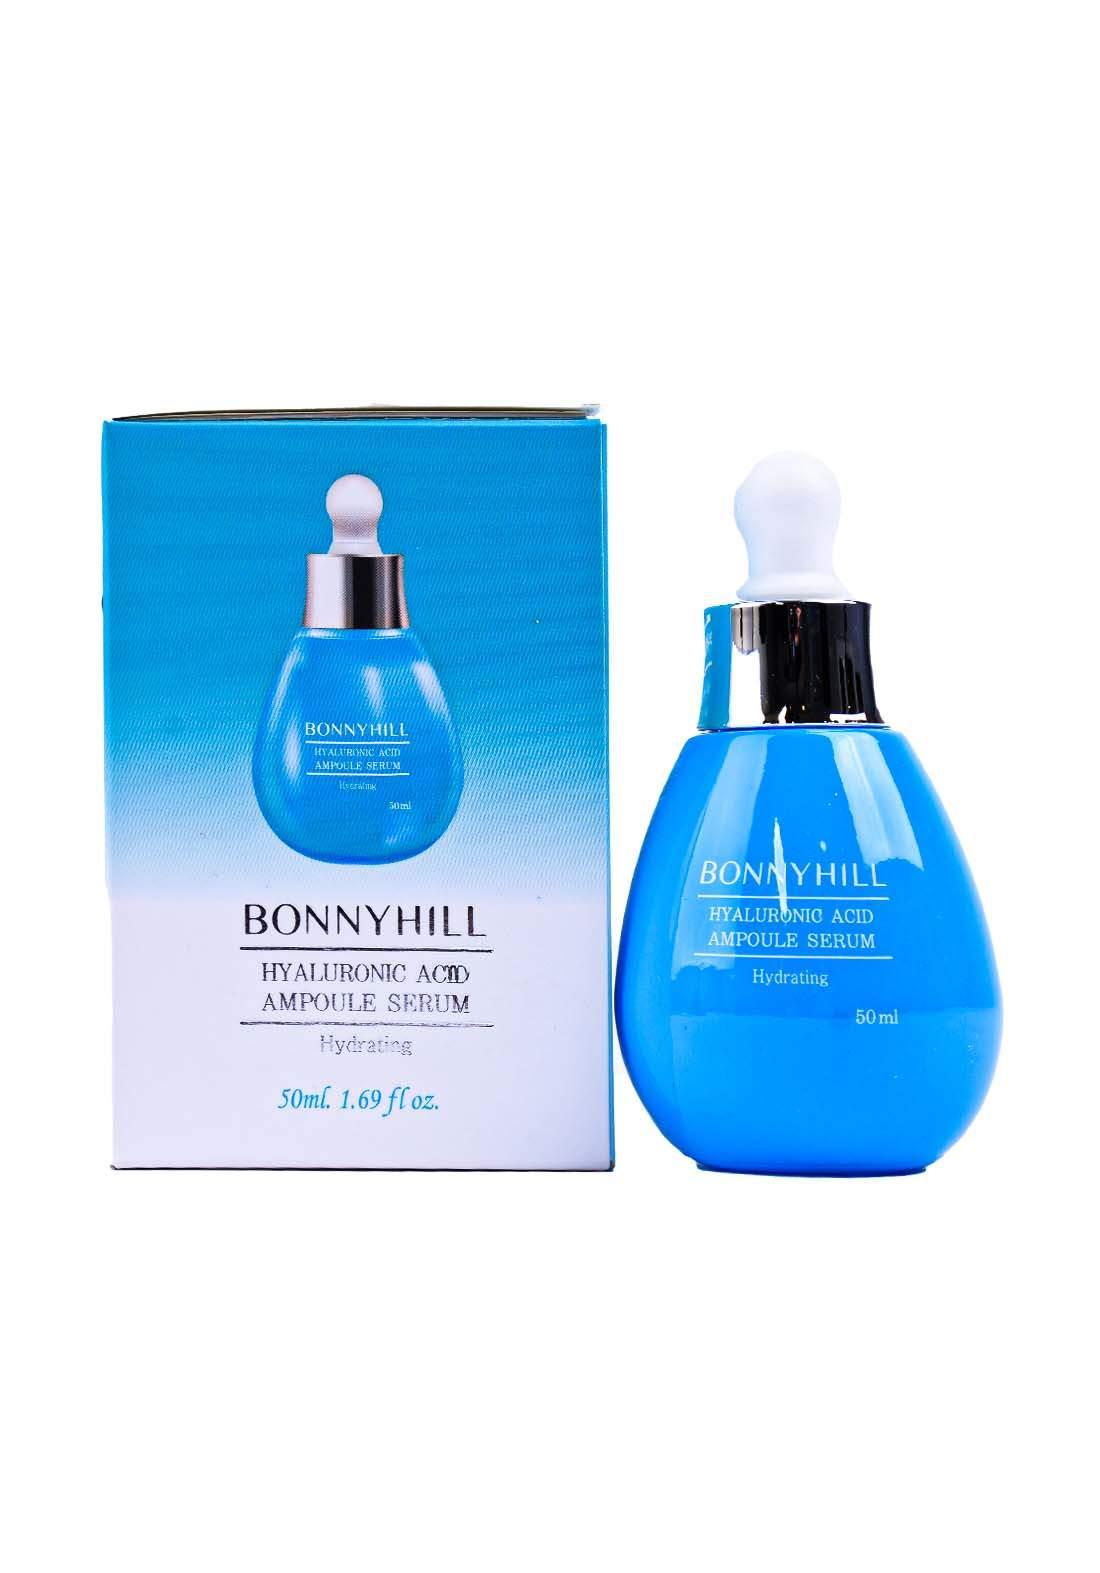 Bonnyhill Peptide Eye Serum 50 ml سيروم مرطب لمنطقة حول العينين